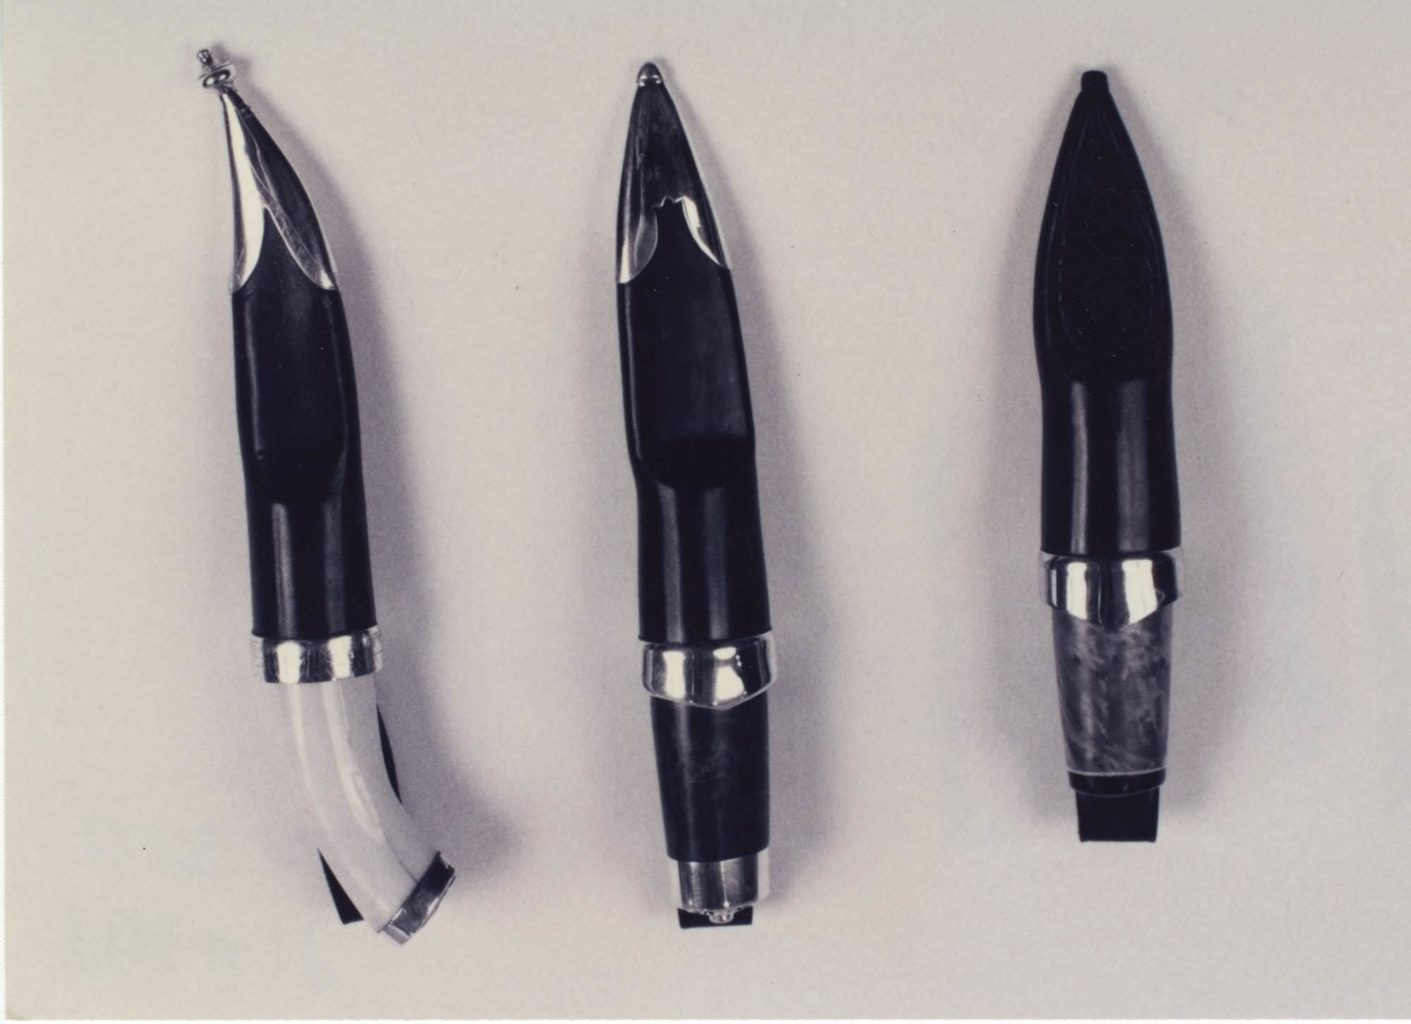 Knife with hippo-tooth handle © 1996 Gene Tokheim Knife with hippo-tooth handle © 1996 Gene Tokheim